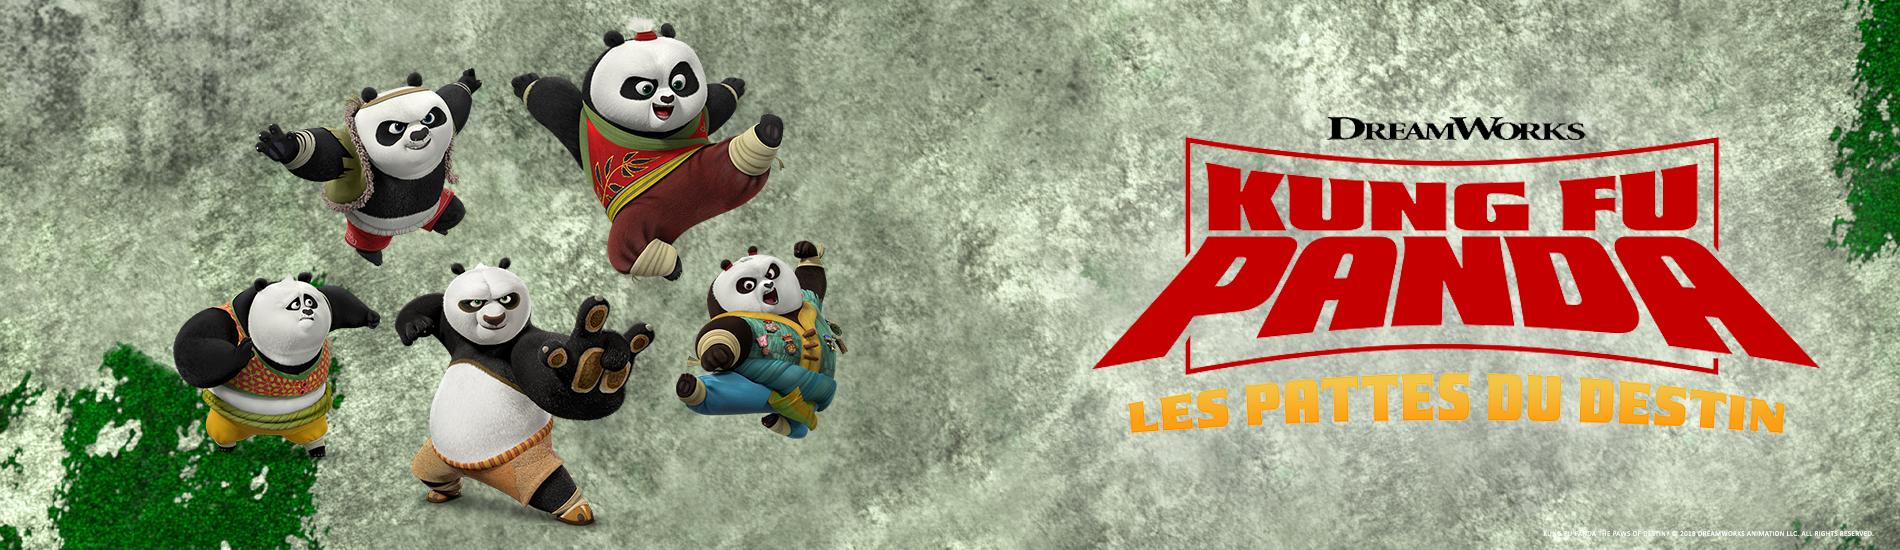 Kung Fu Panda : les pattes du destin  en streaming sur Gulli Replay